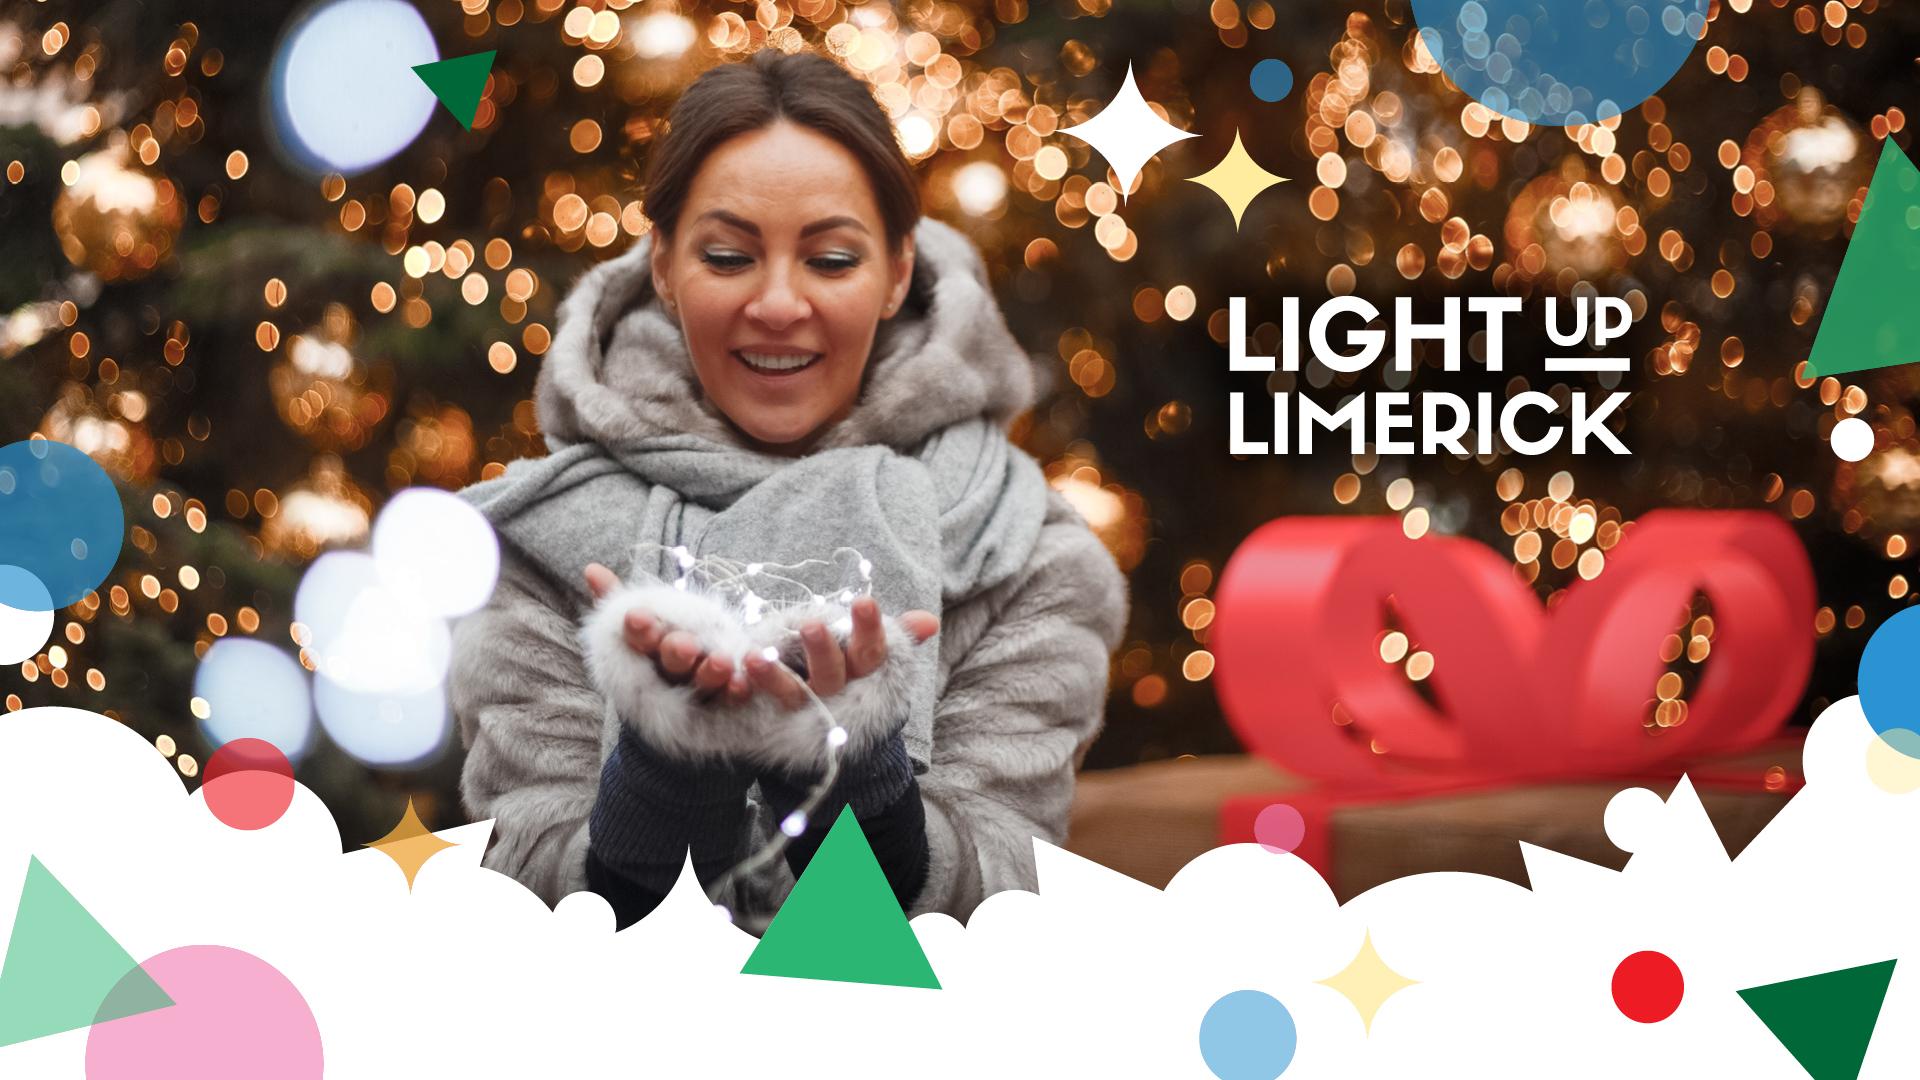 Light Up Limerick